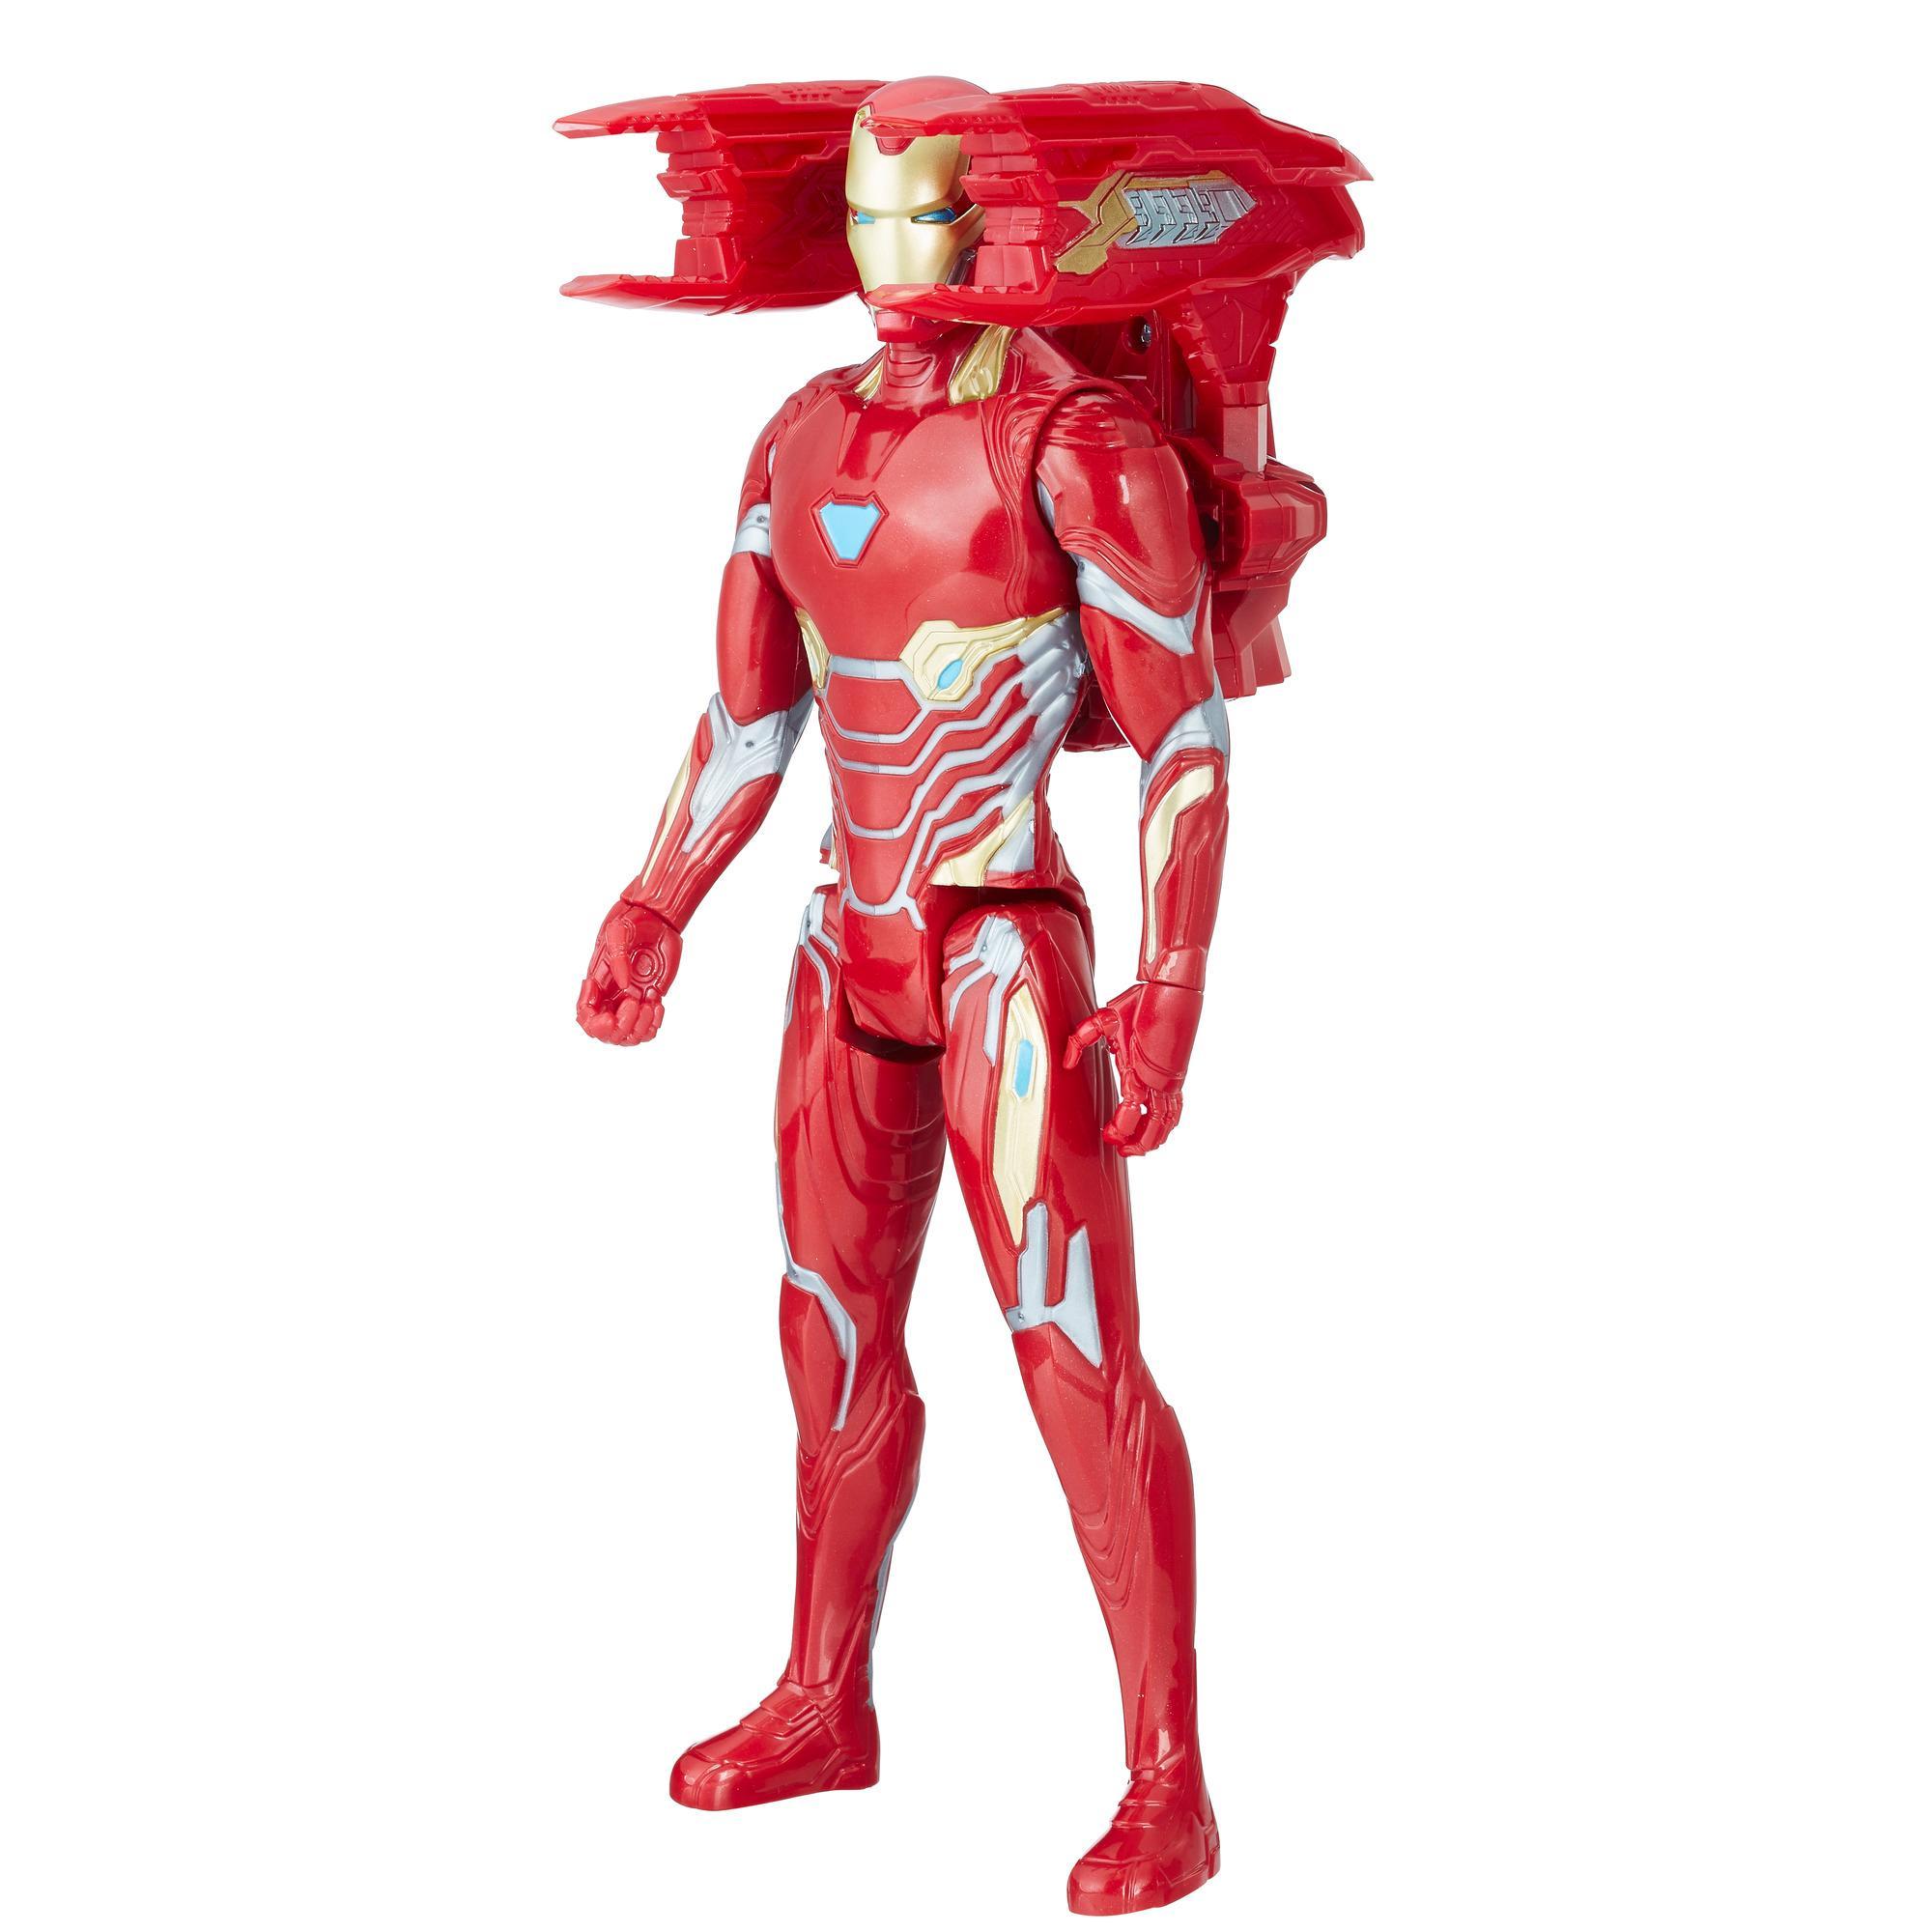 Marvel Avengers: Infinity War Titan Hero Power FX Iron Man